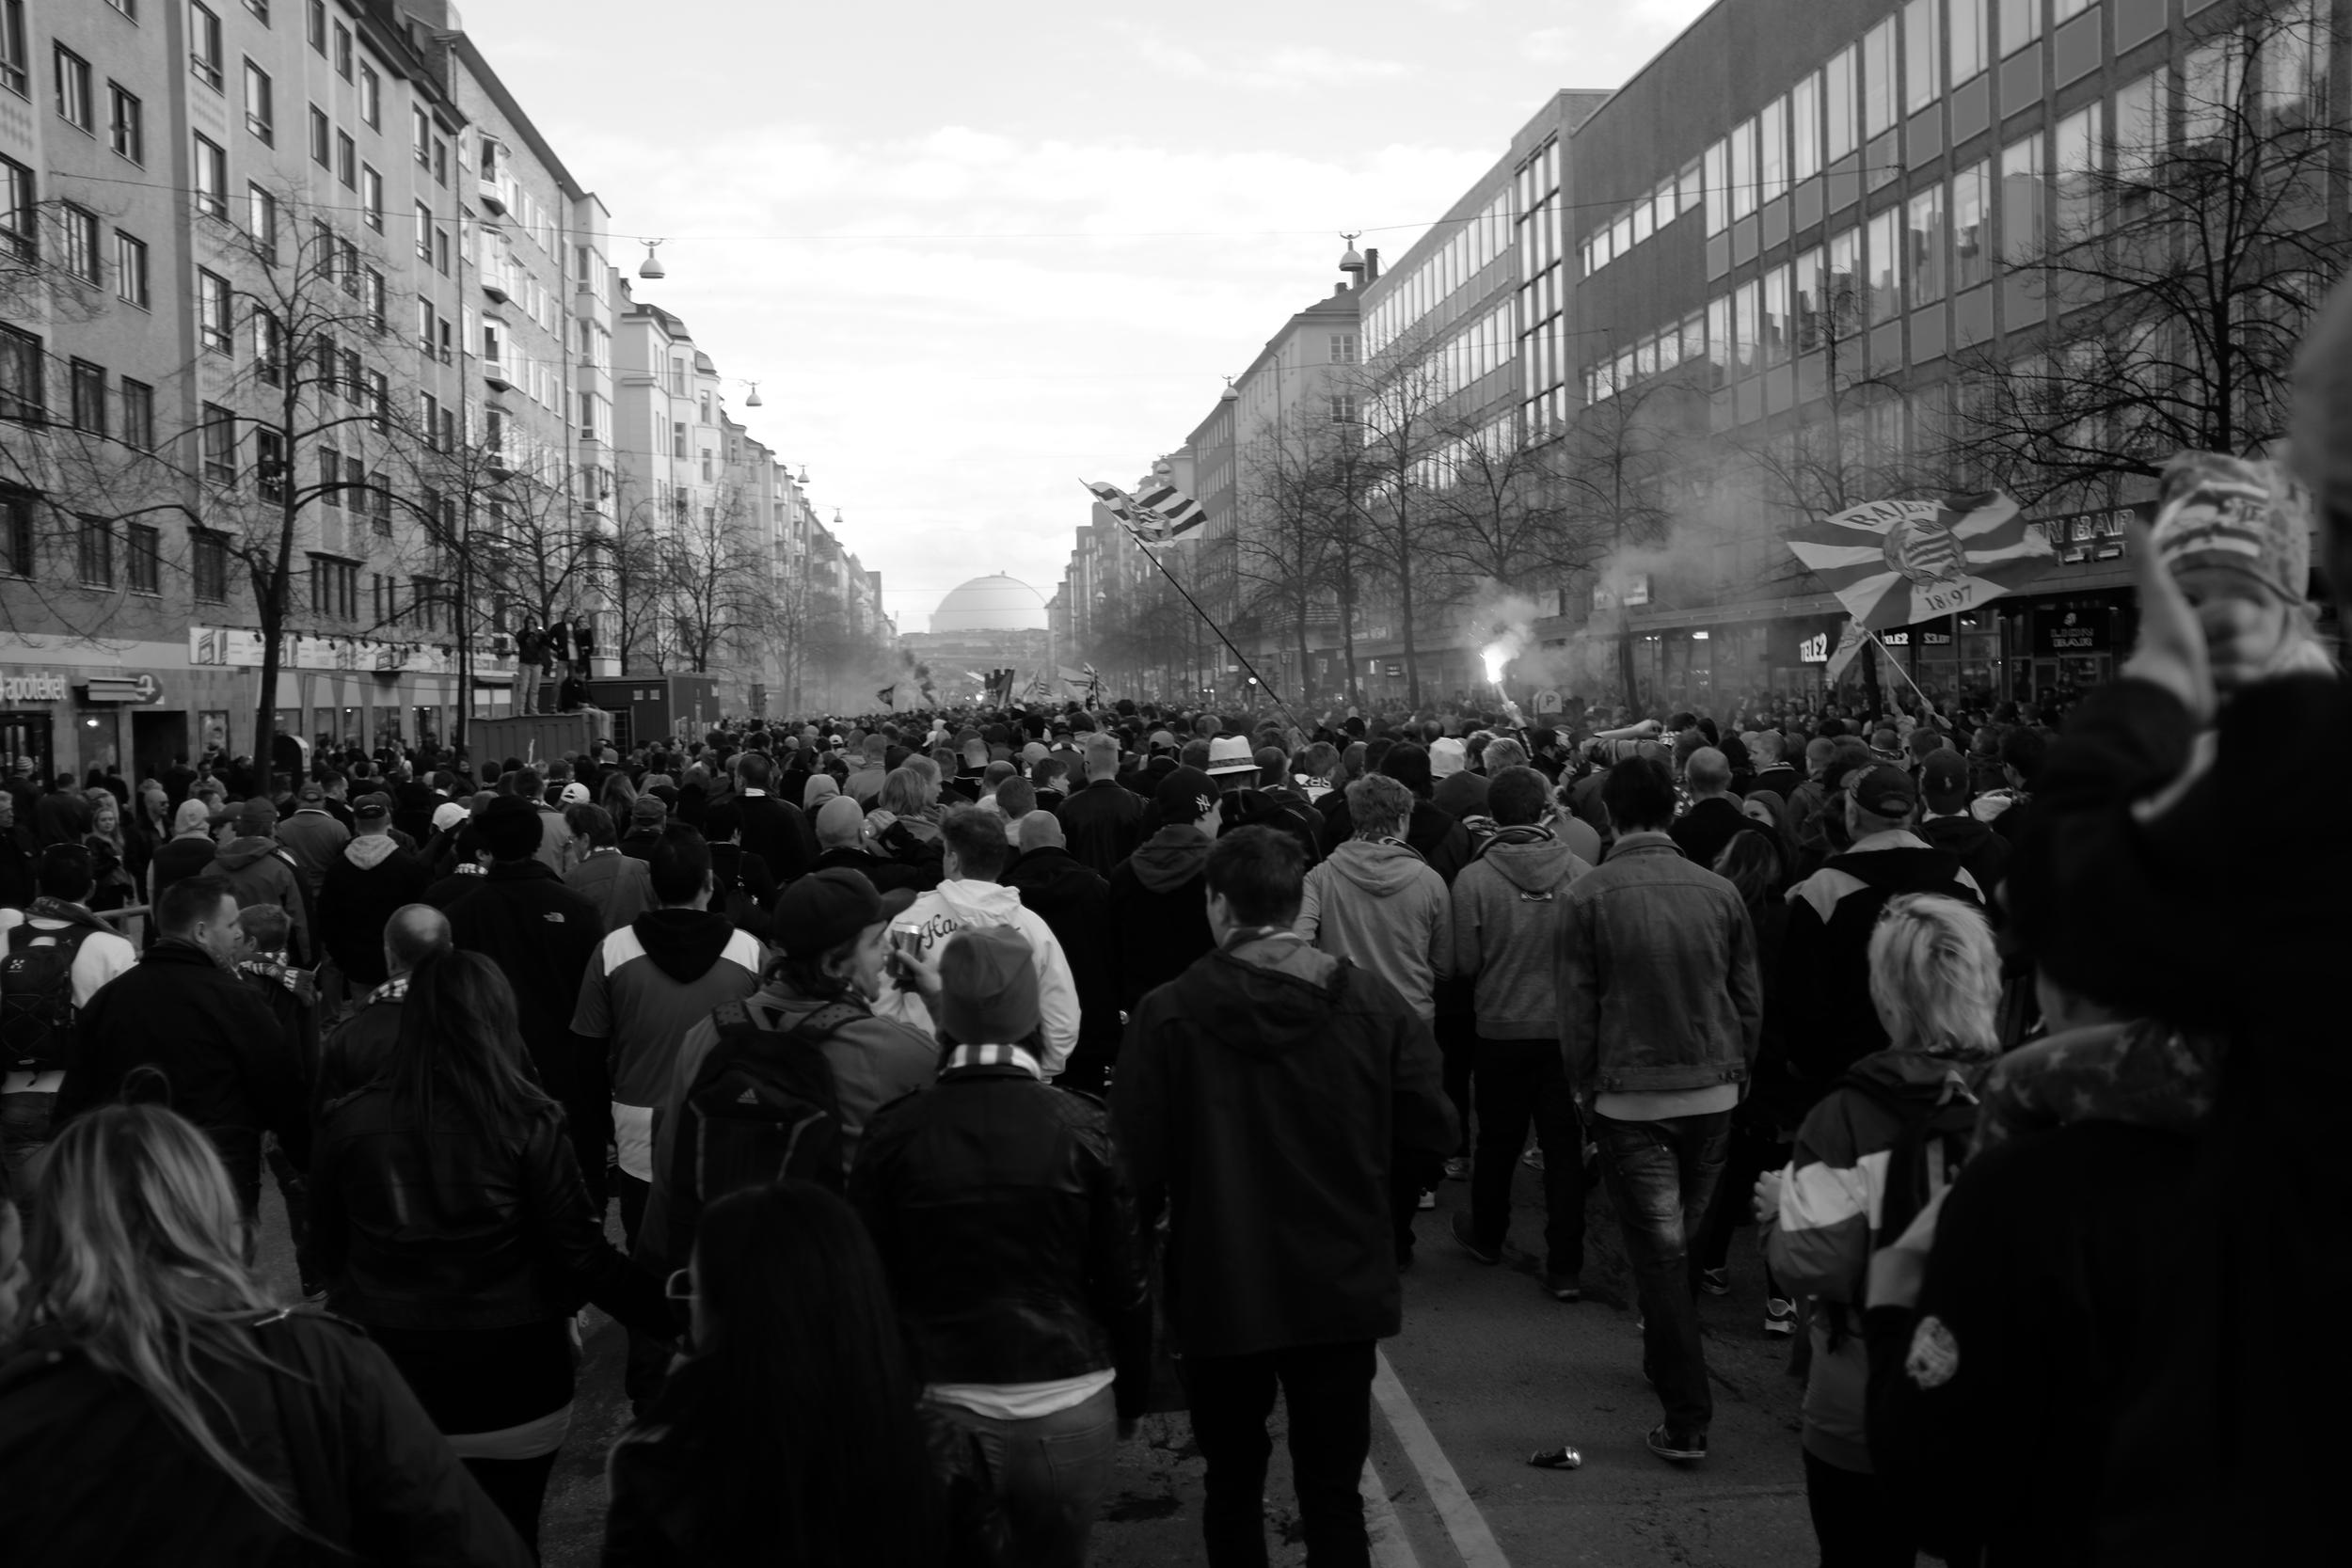 Foto: Virre Linwendil Annergård/ CC BY-NC-ND 2.0